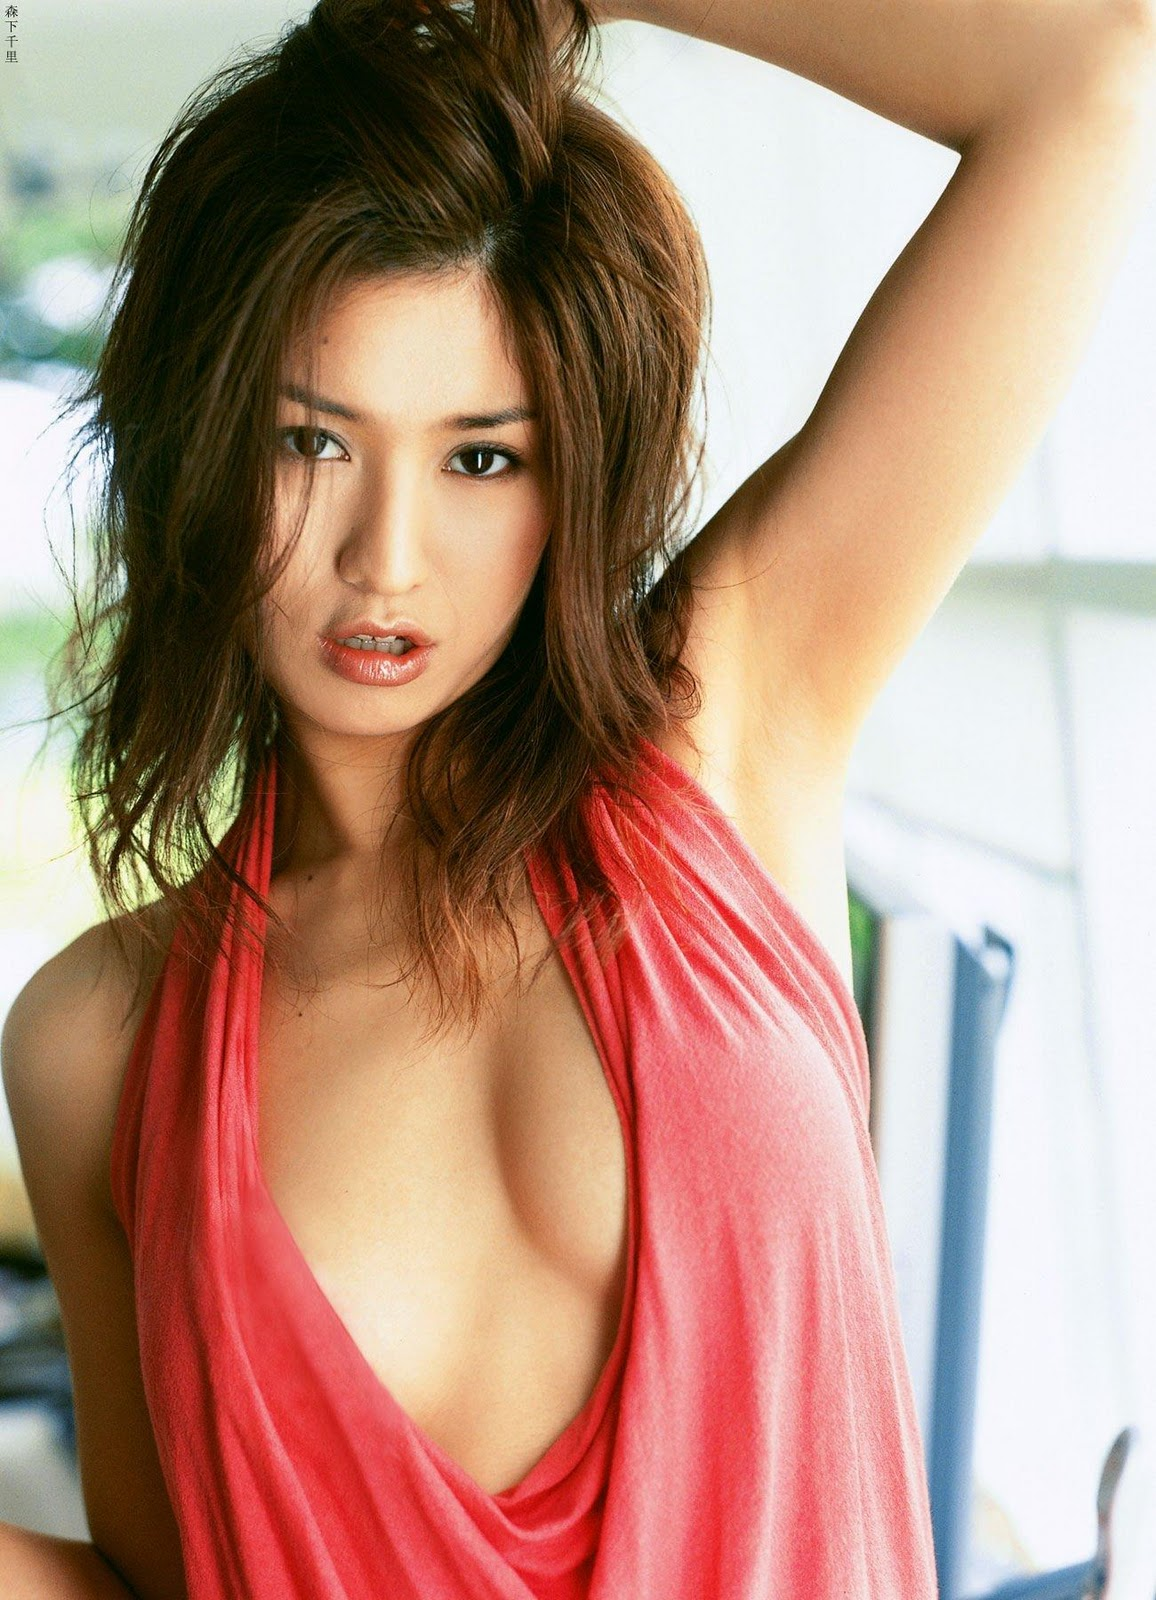 Beautiful asian models in bikinis sense